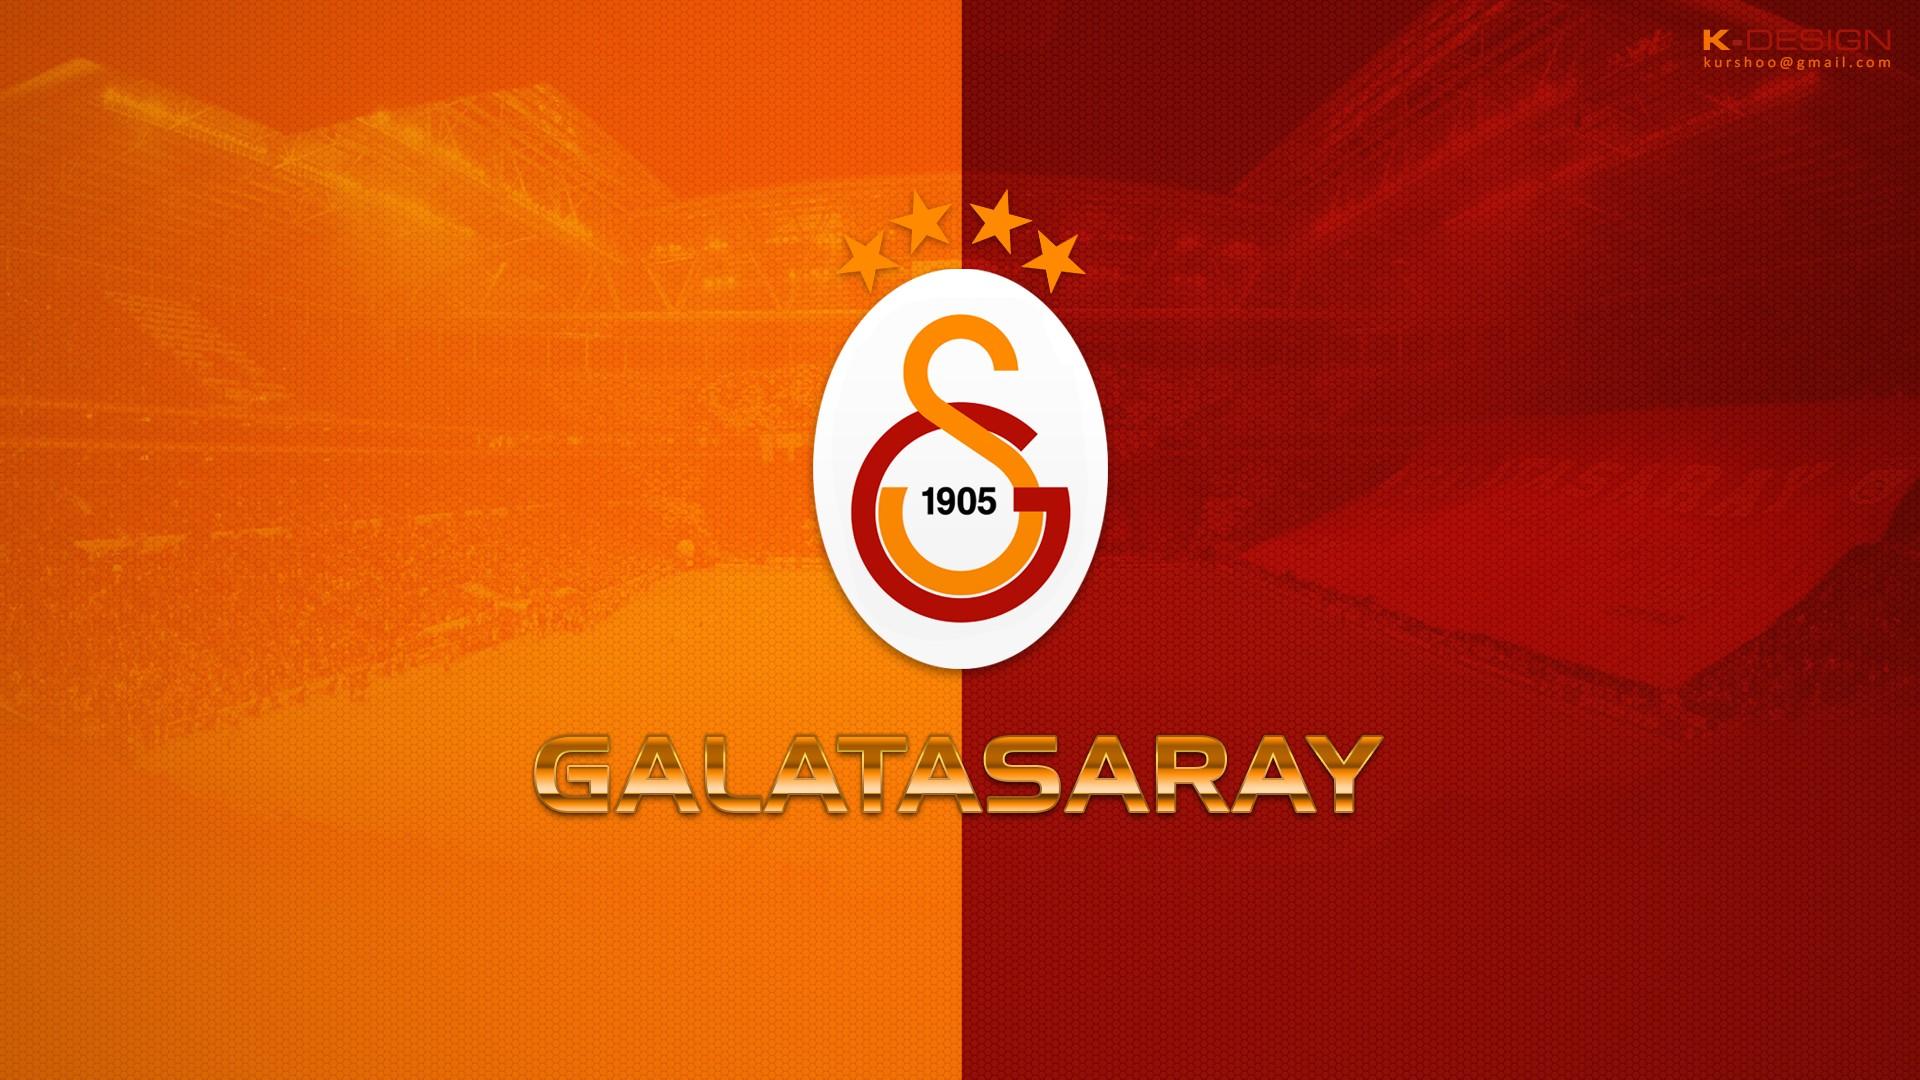 Hintergrundbilder 1920x1080 Px Galatasaray S K L 246 We